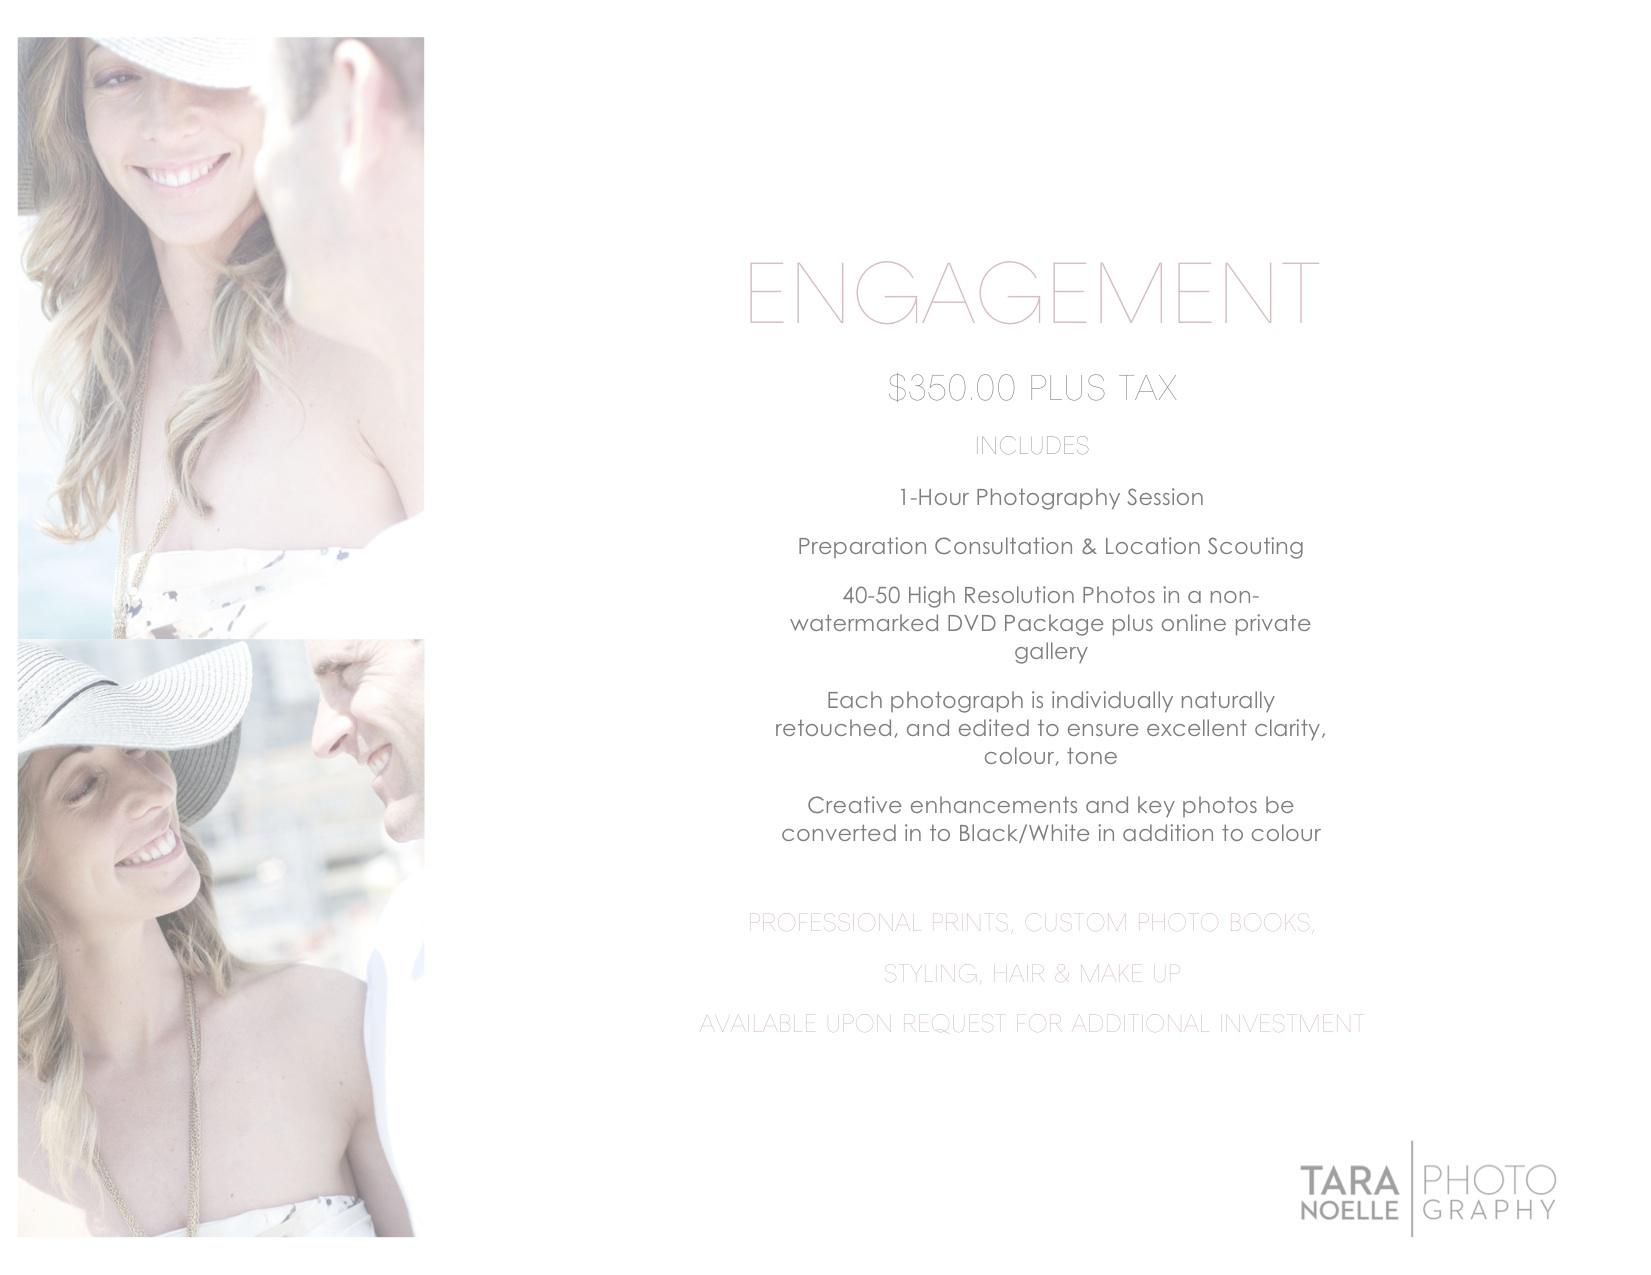 Tara Noelle Photography l Wedding Packages l 2013 3.jpg